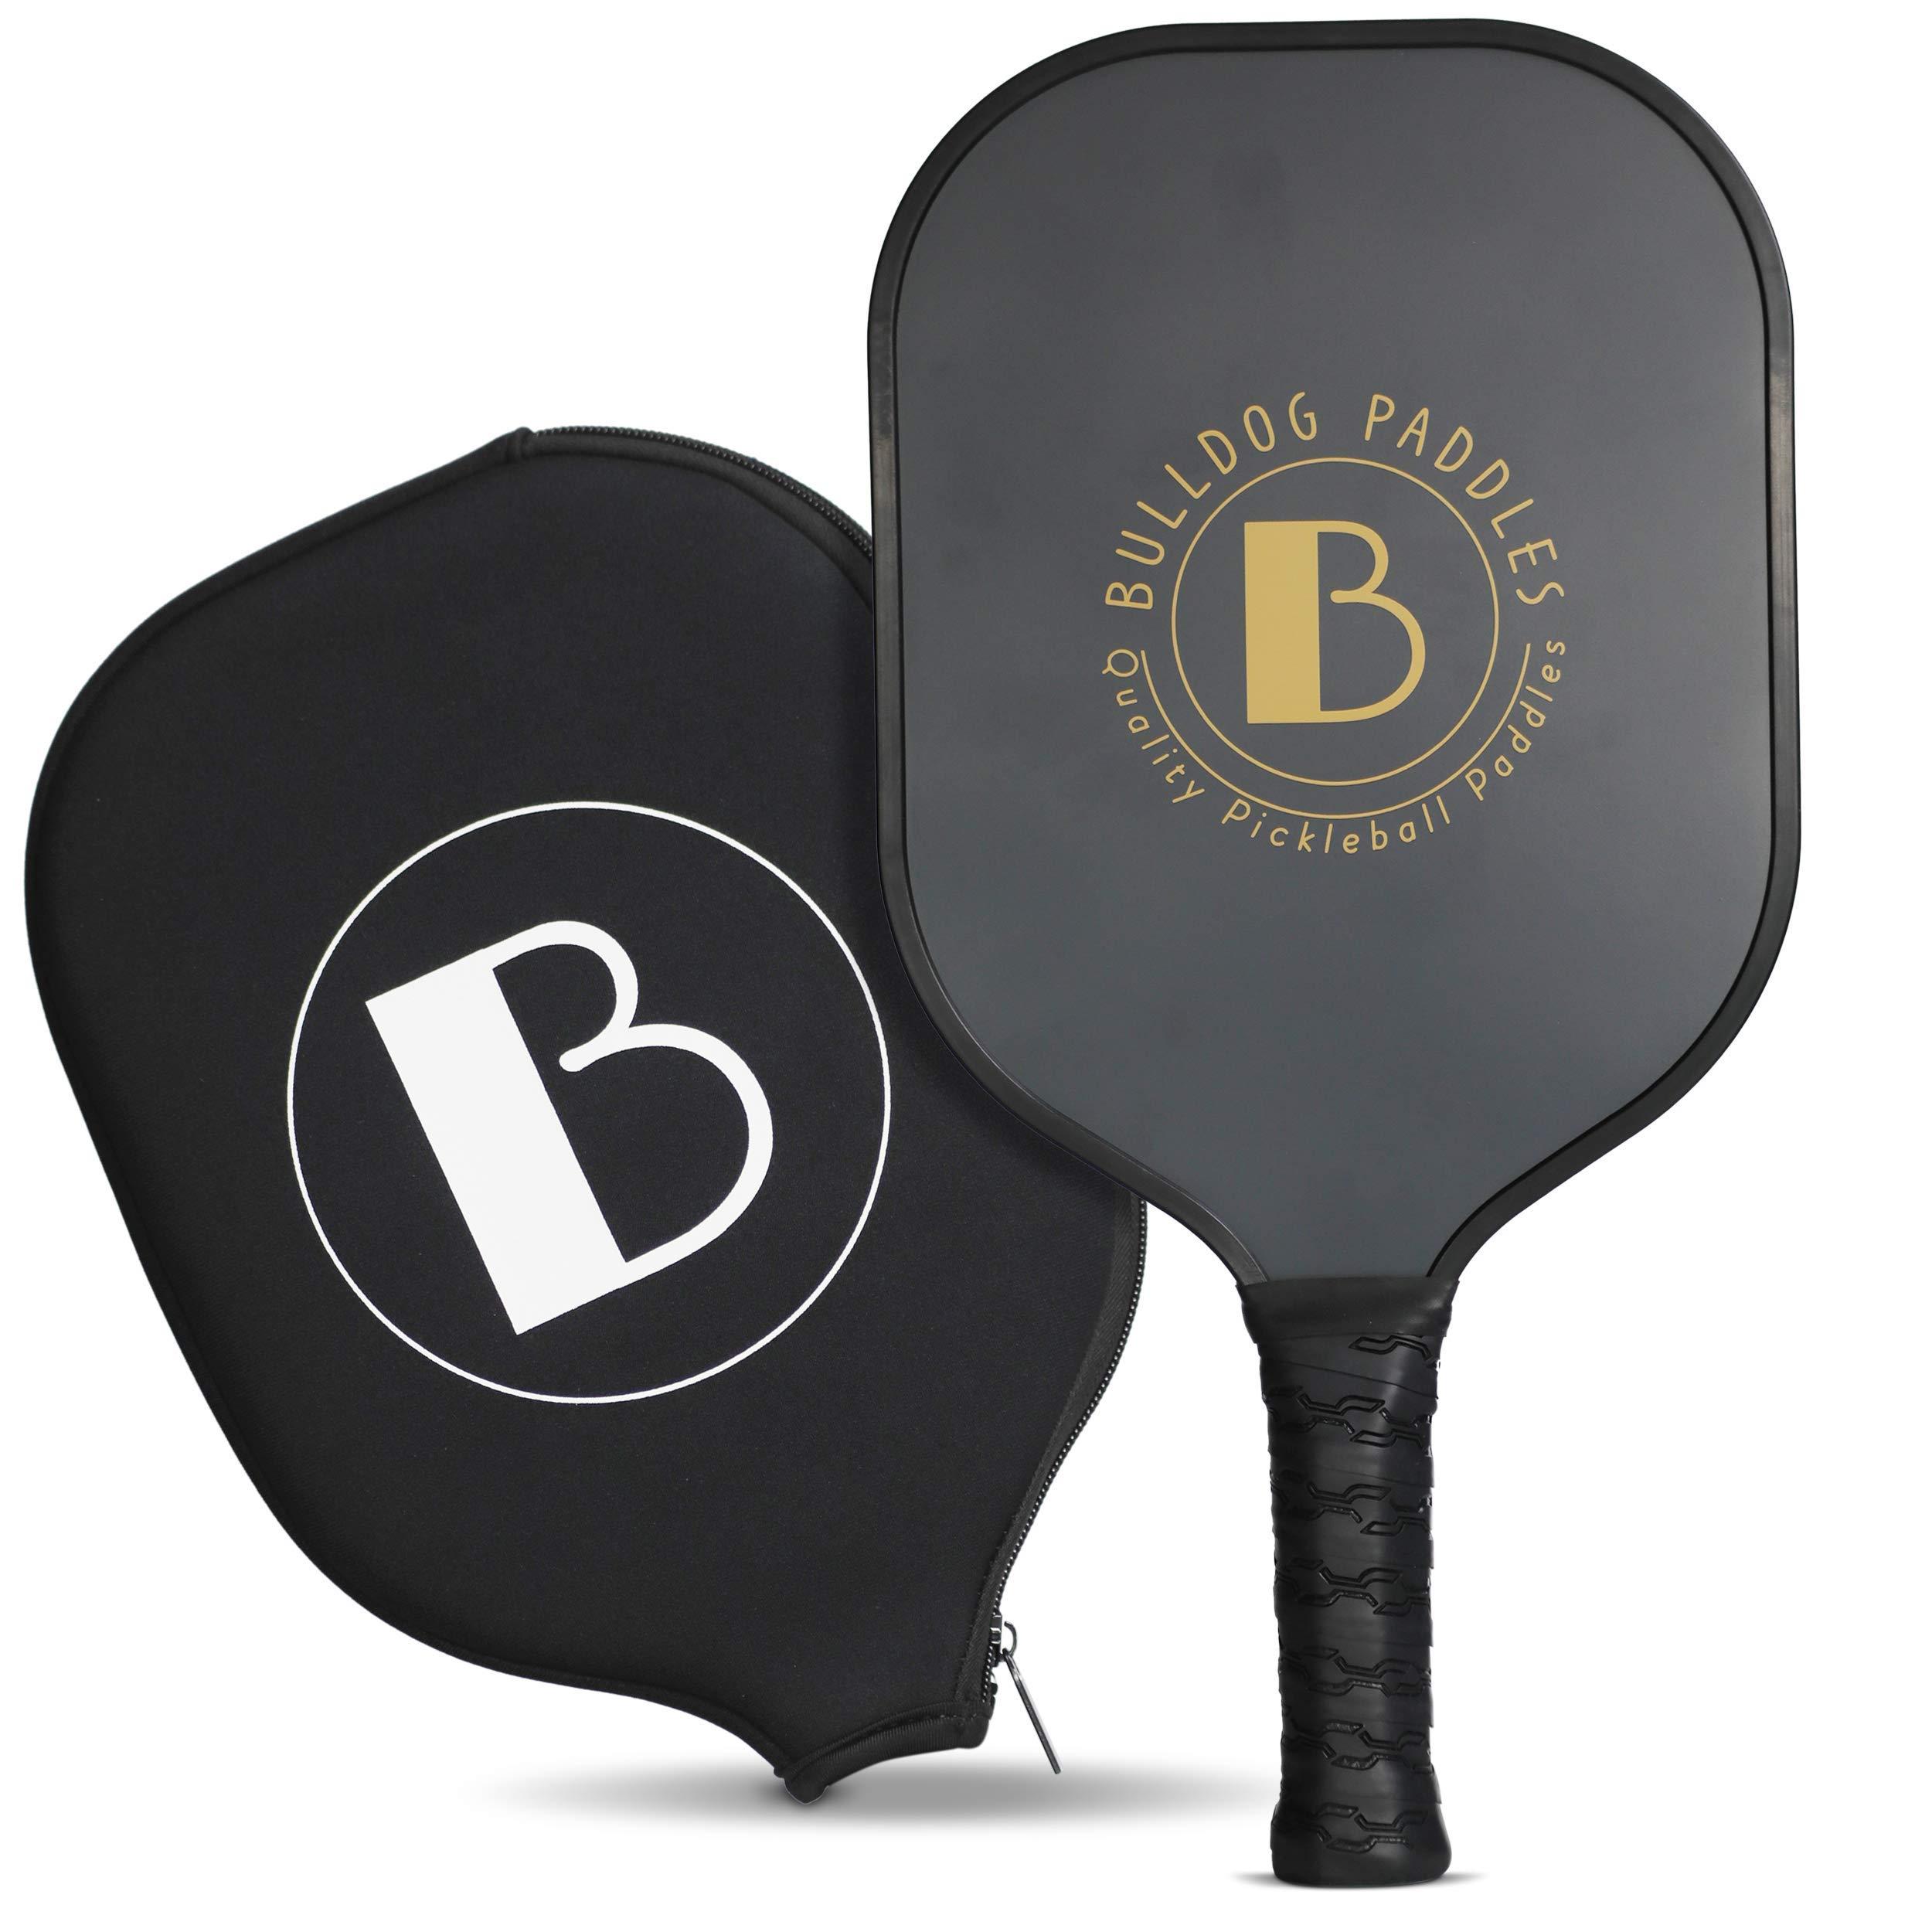 Bulldog Paddles Graphite Pickleball Paddle - Pickle Ball Pad